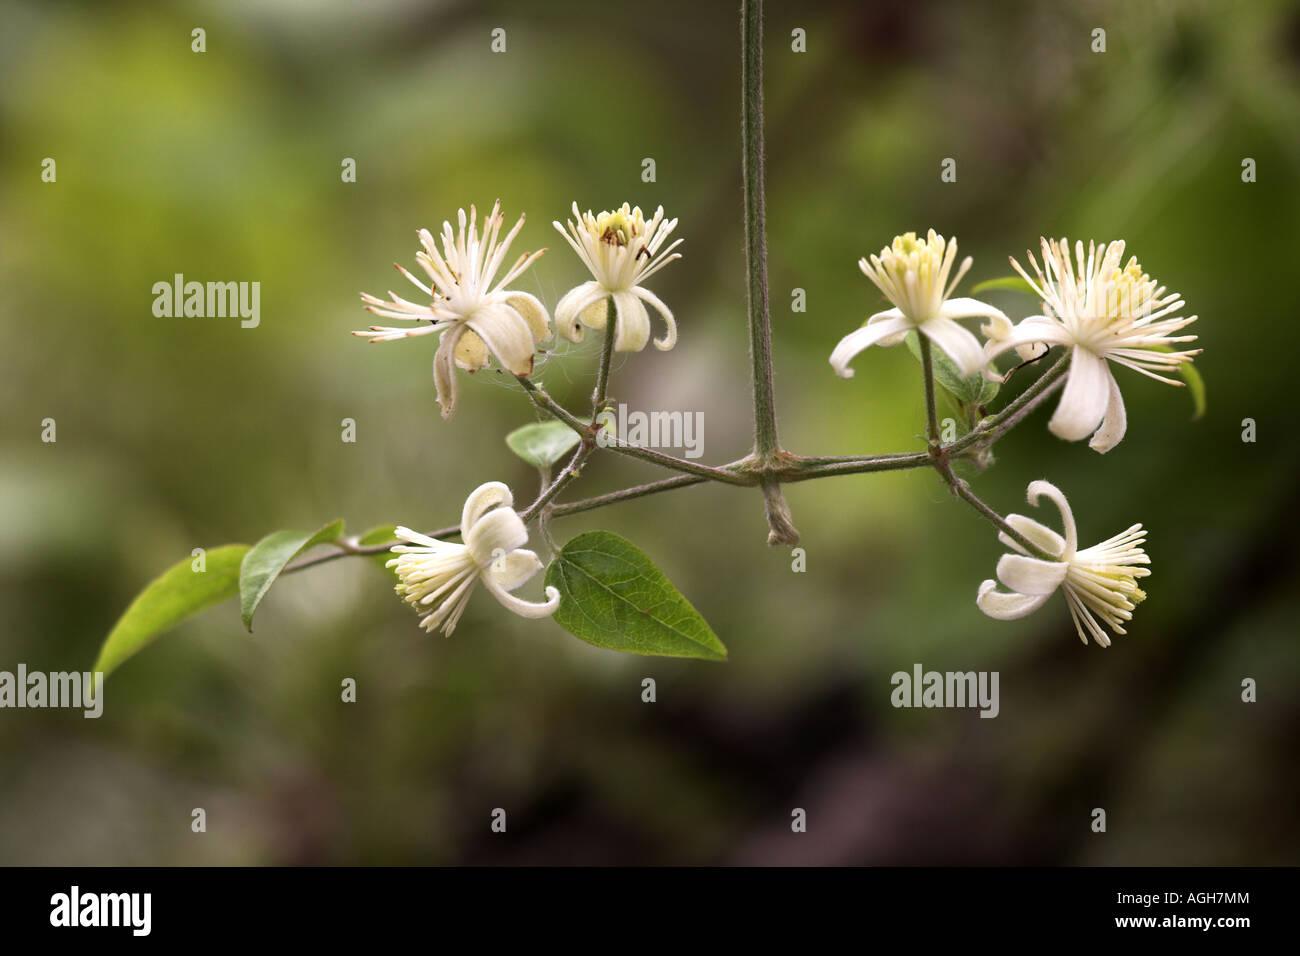 Traveller's Joy (Old Man's Beard) Clematis vitalba in flower @ Potteric Carr Nature Reserve South Yokshire - Stock Image